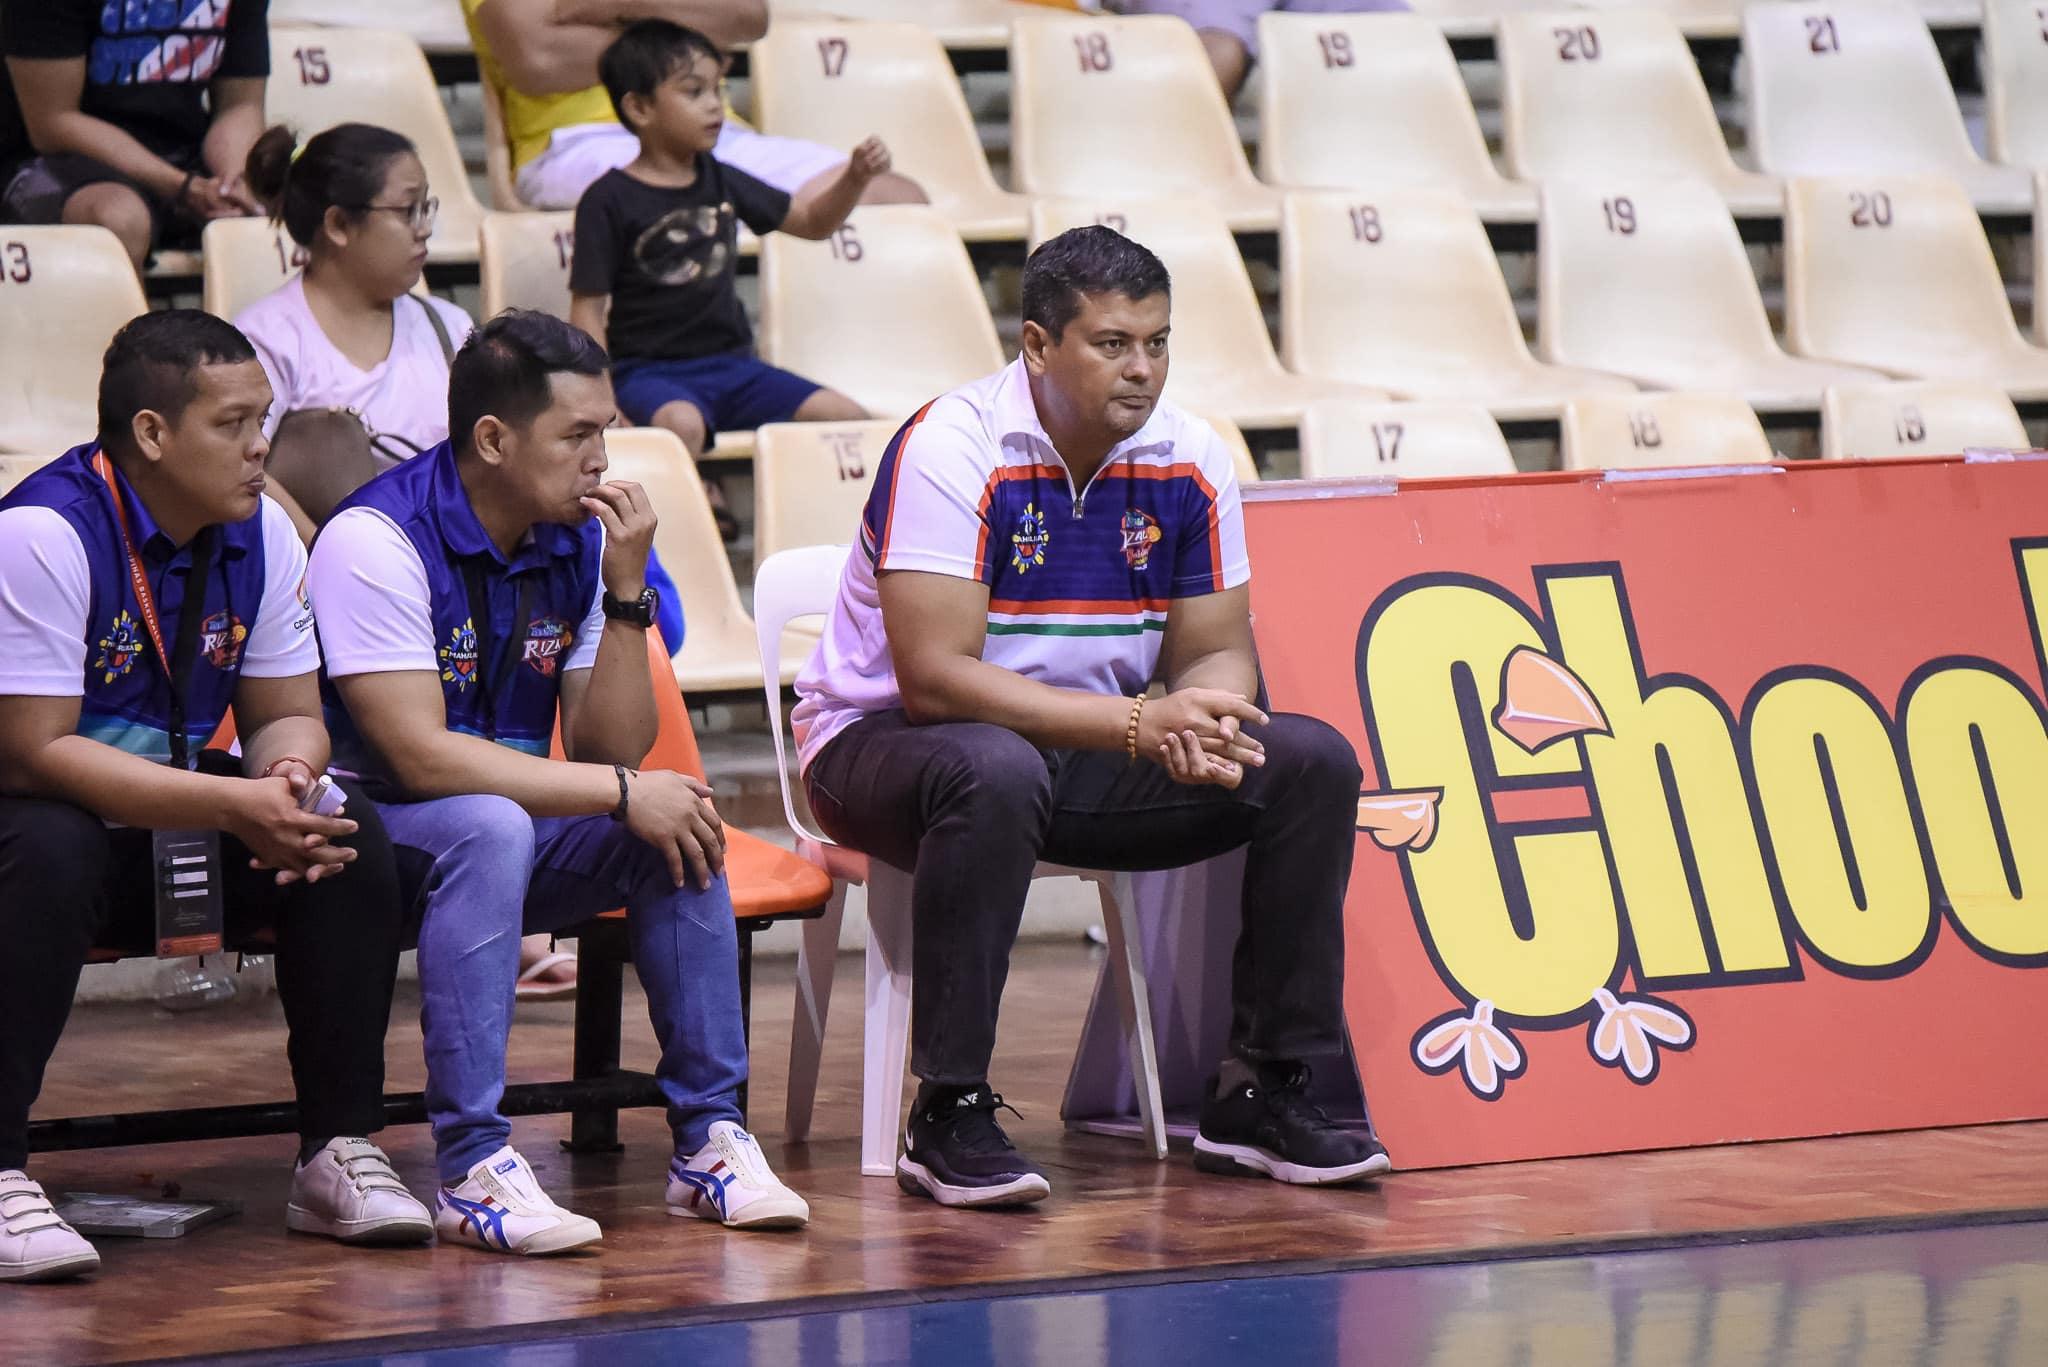 Tiebreaker Times Rizal signs Eloy Poligrates, looking for new coach Basketball MPBL News  Rizal-Xentro Mall Golden Coolers Nikko Panganiban Jayvee Gayoso Eloy Poligrates Anj Anzores 2019-20 MPBL Lakan Cup